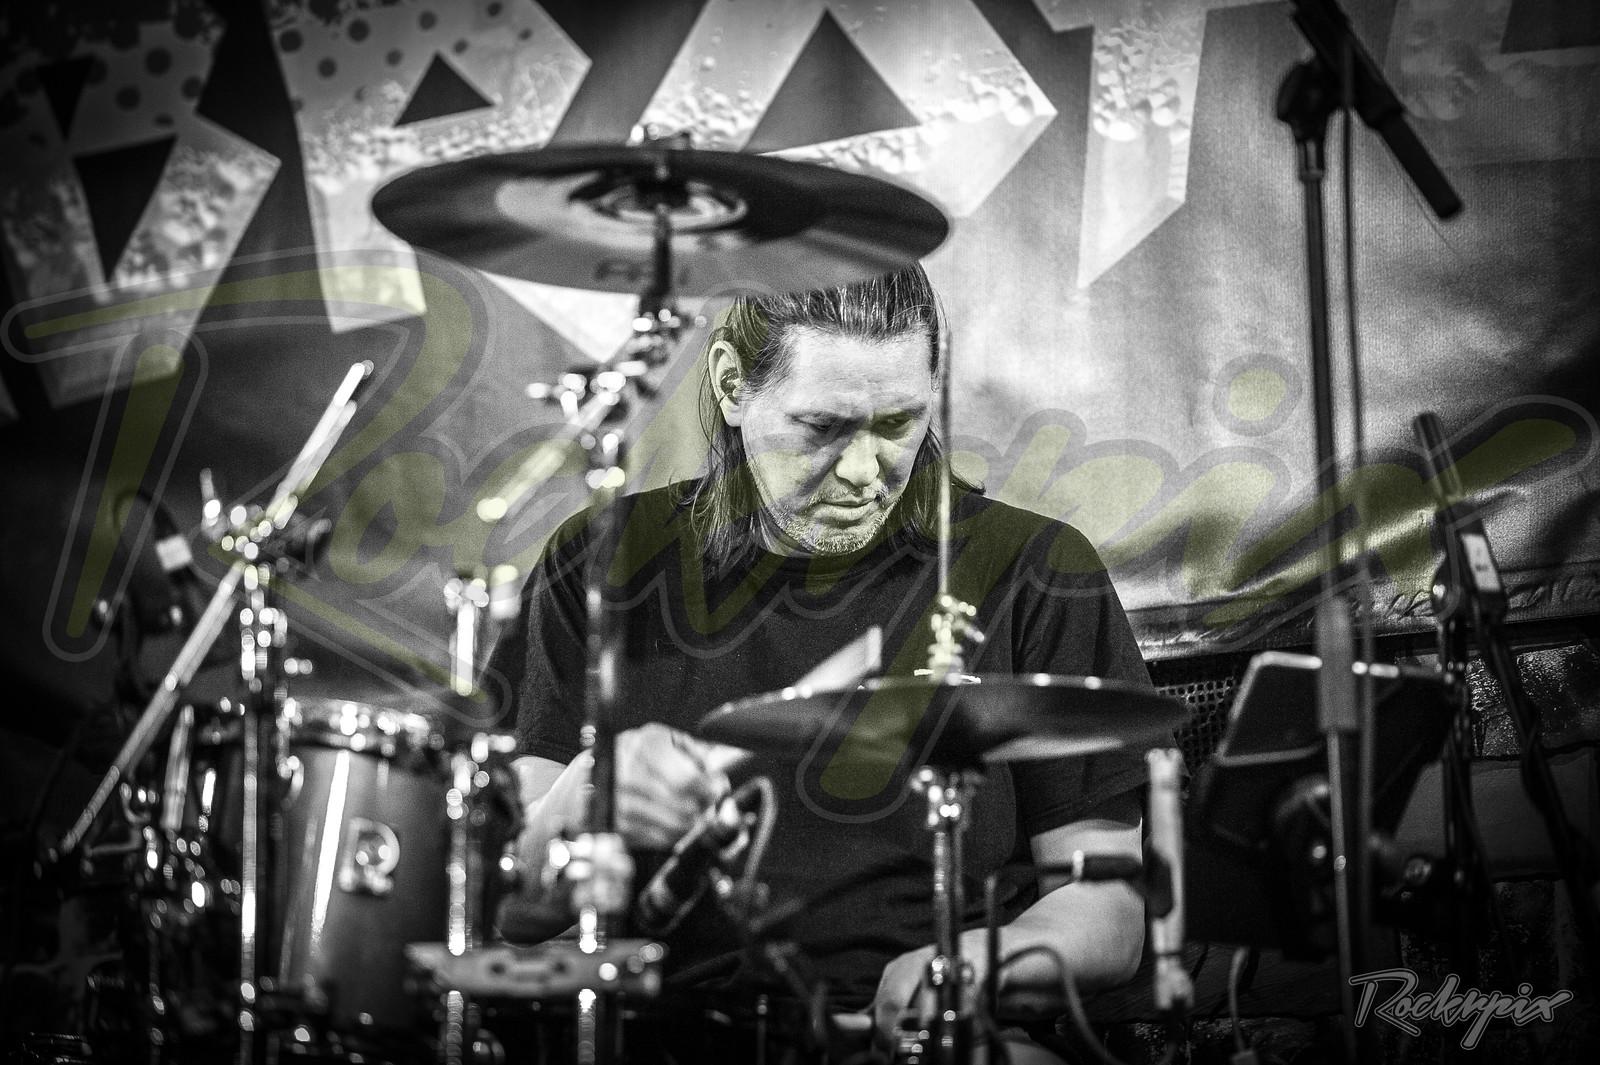 ©Rockrpix - Angelo Tristian Band